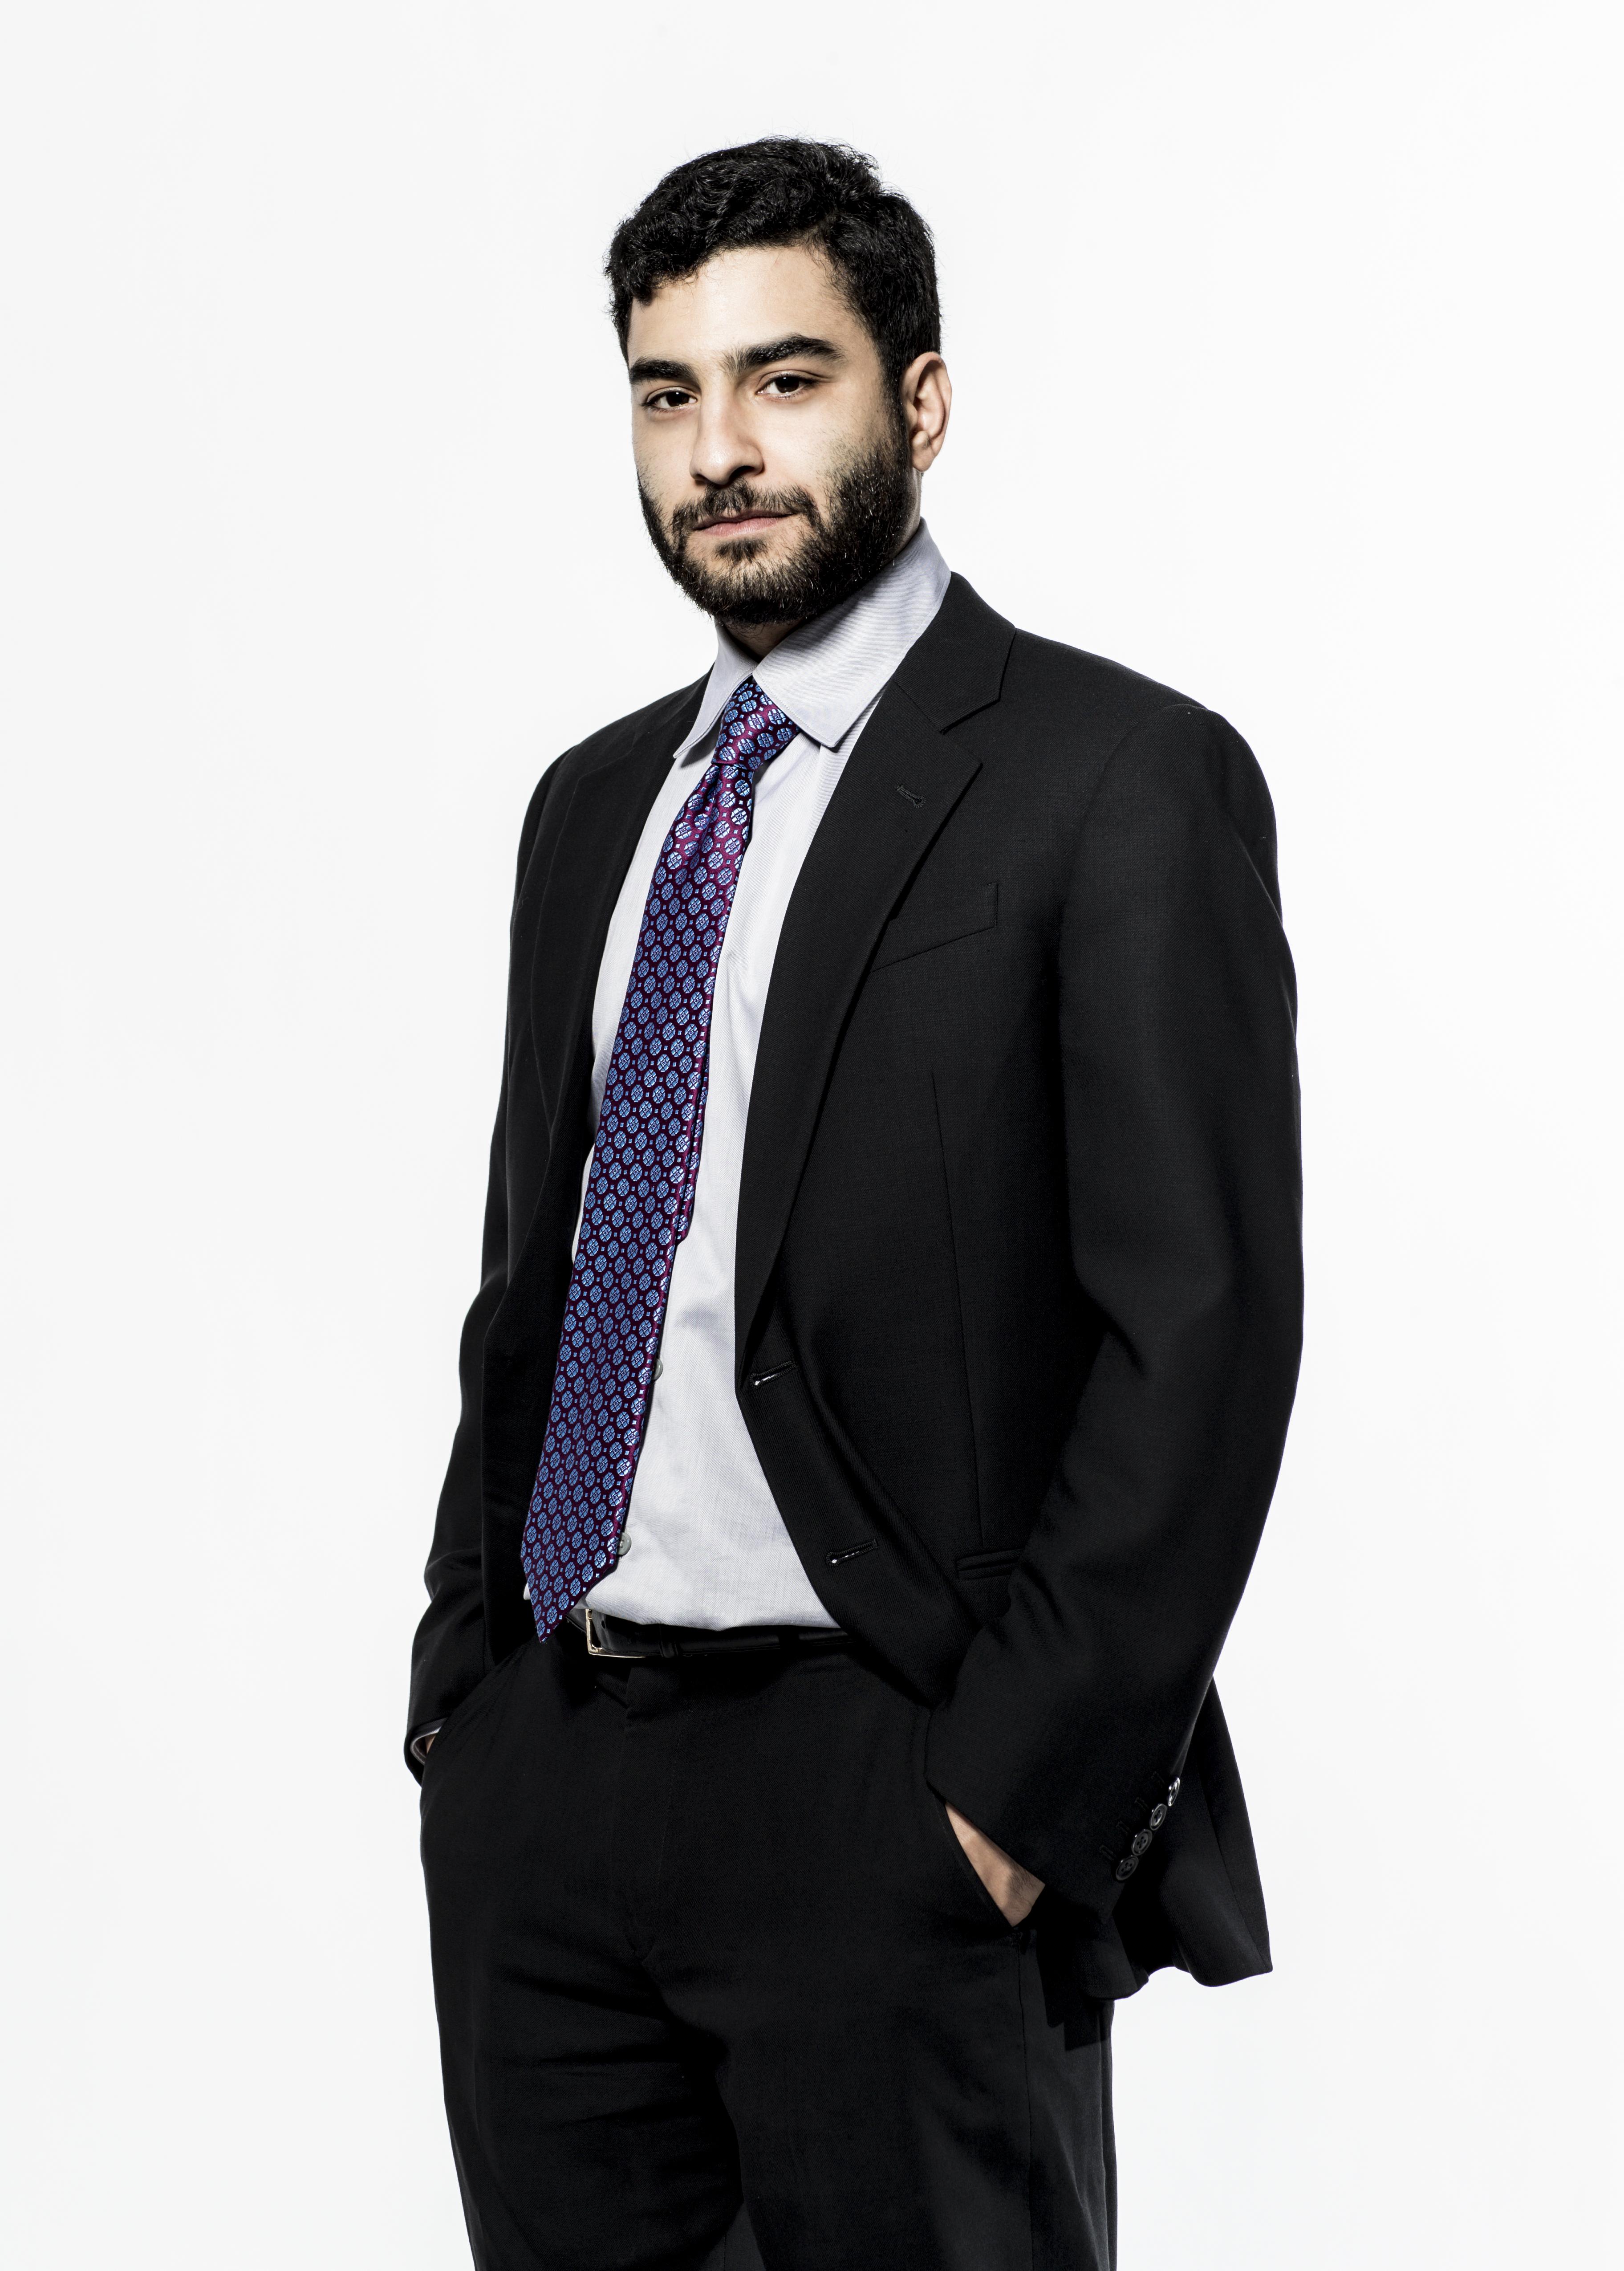 Farouk Systems Announces New Leadership Role for Farouk Shami II